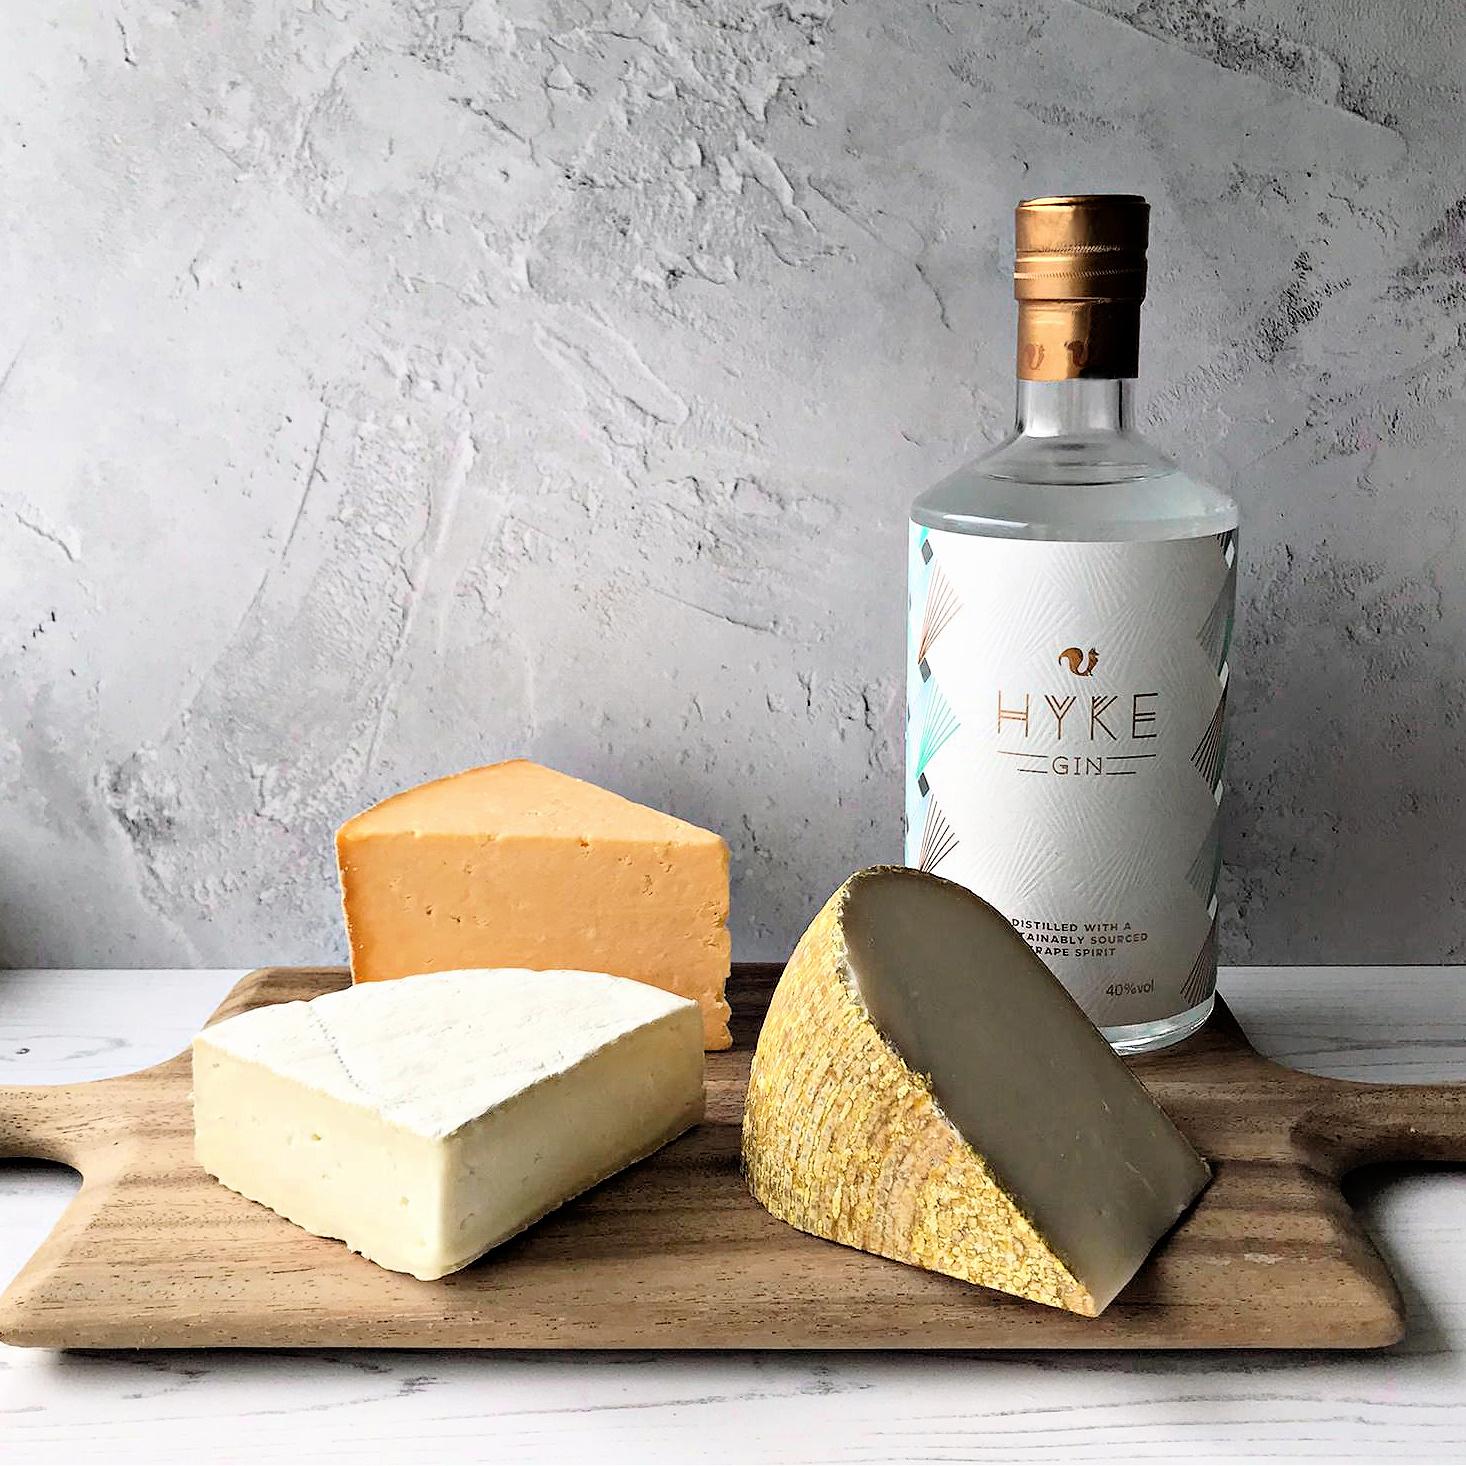 Hyke-Gin-and-Cheese-Photoshopped